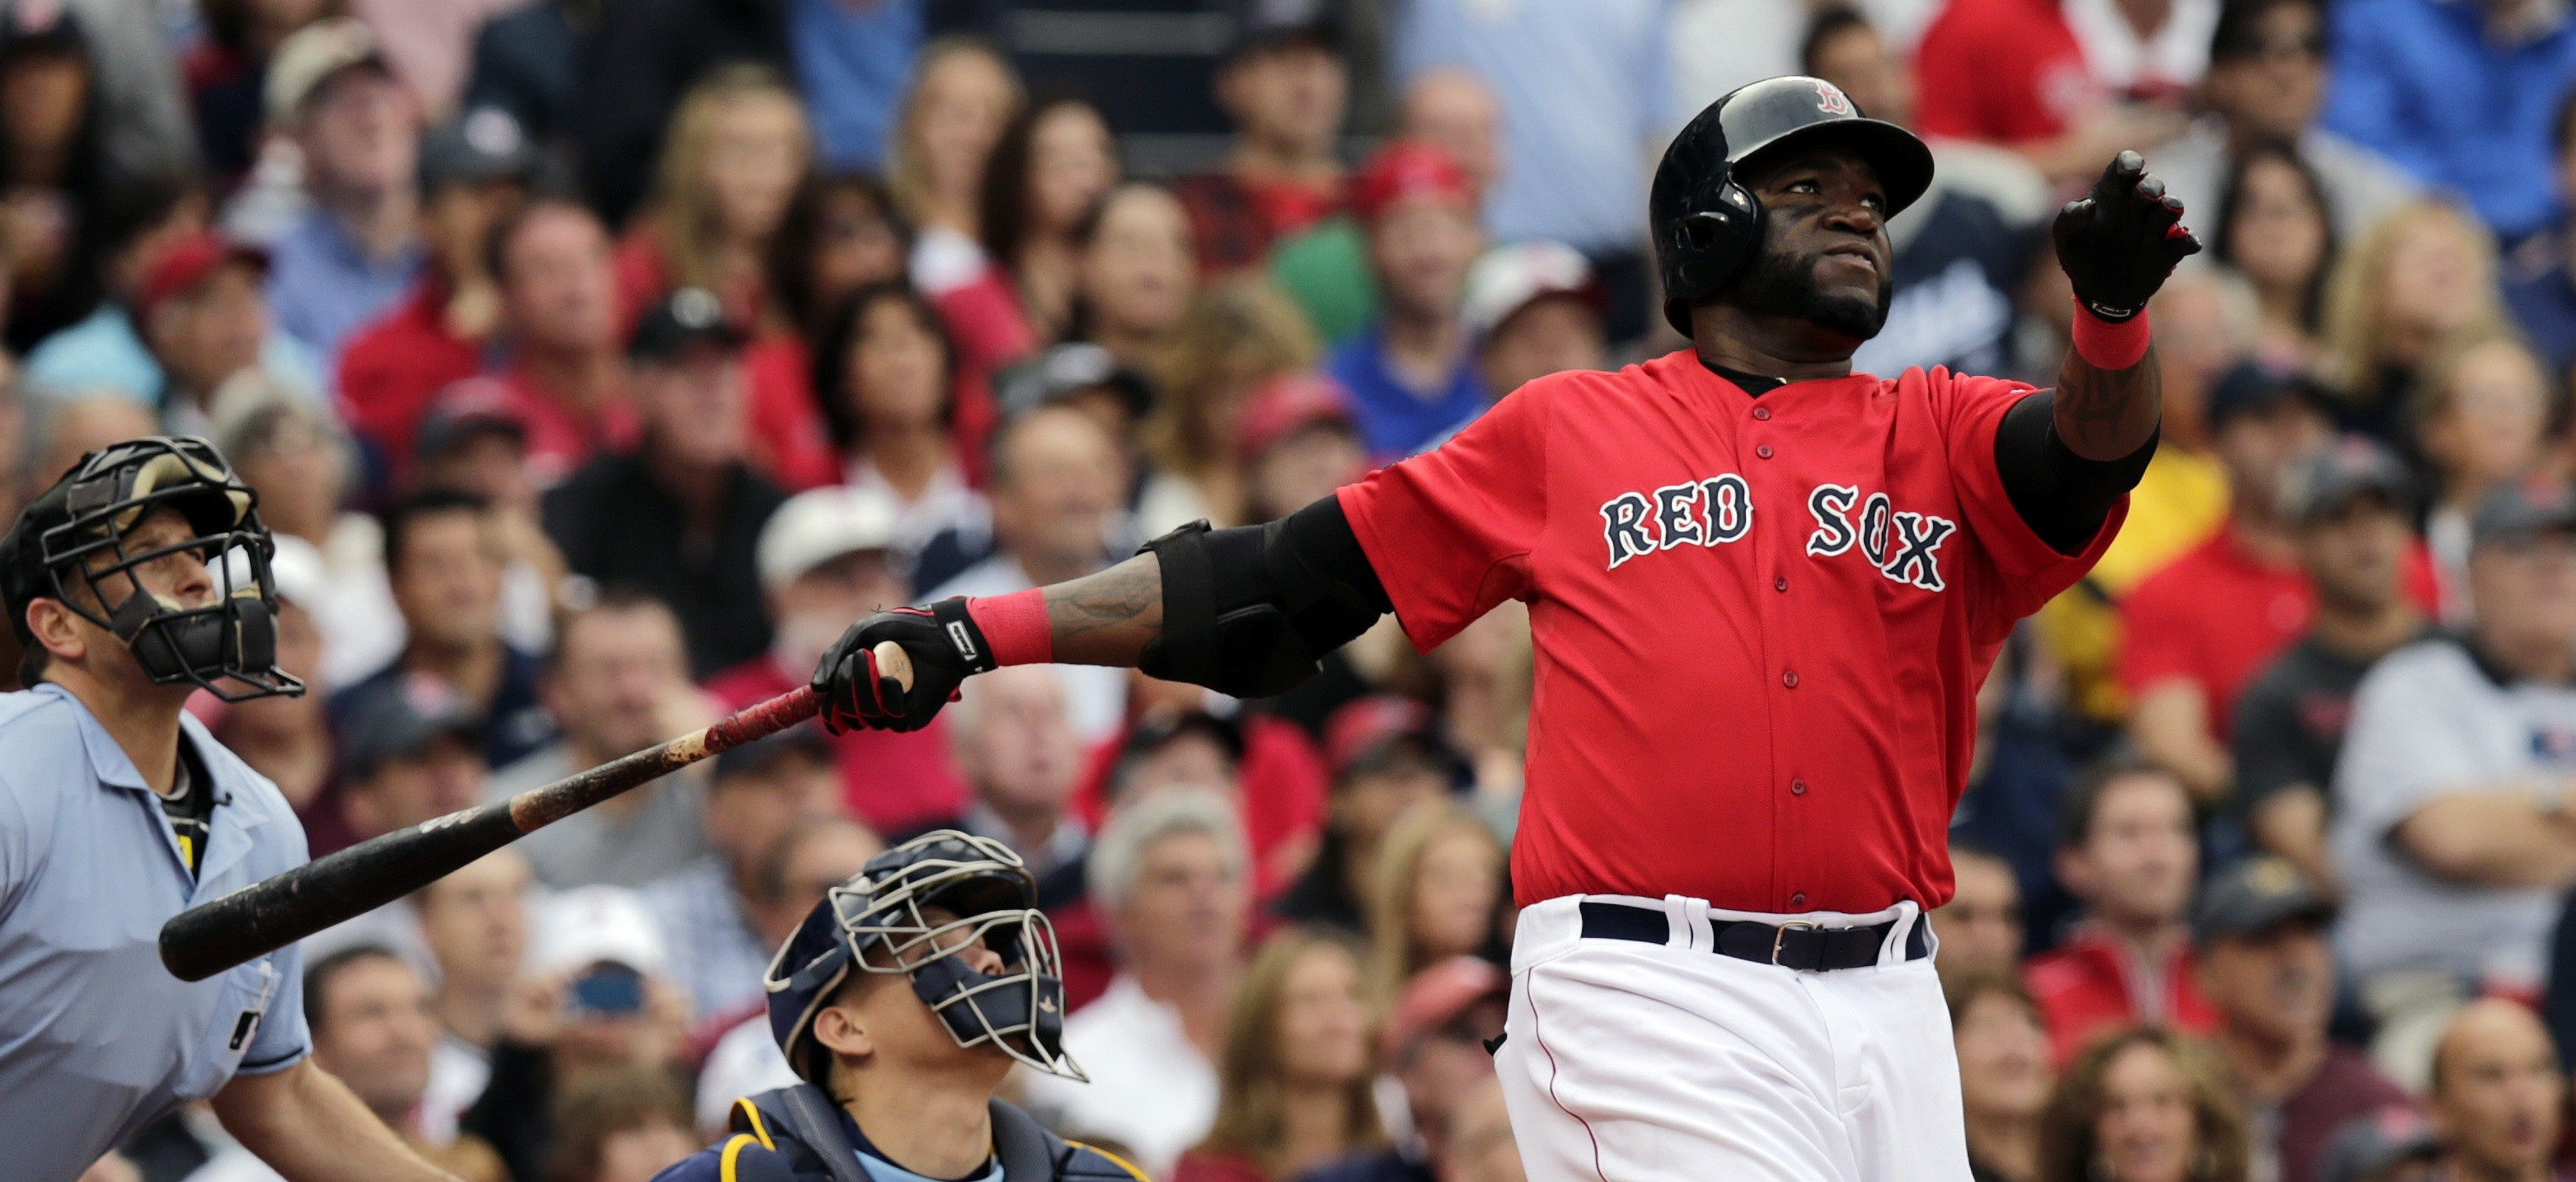 Boston Red Sox Wallpaper Screensavers (61+ images)